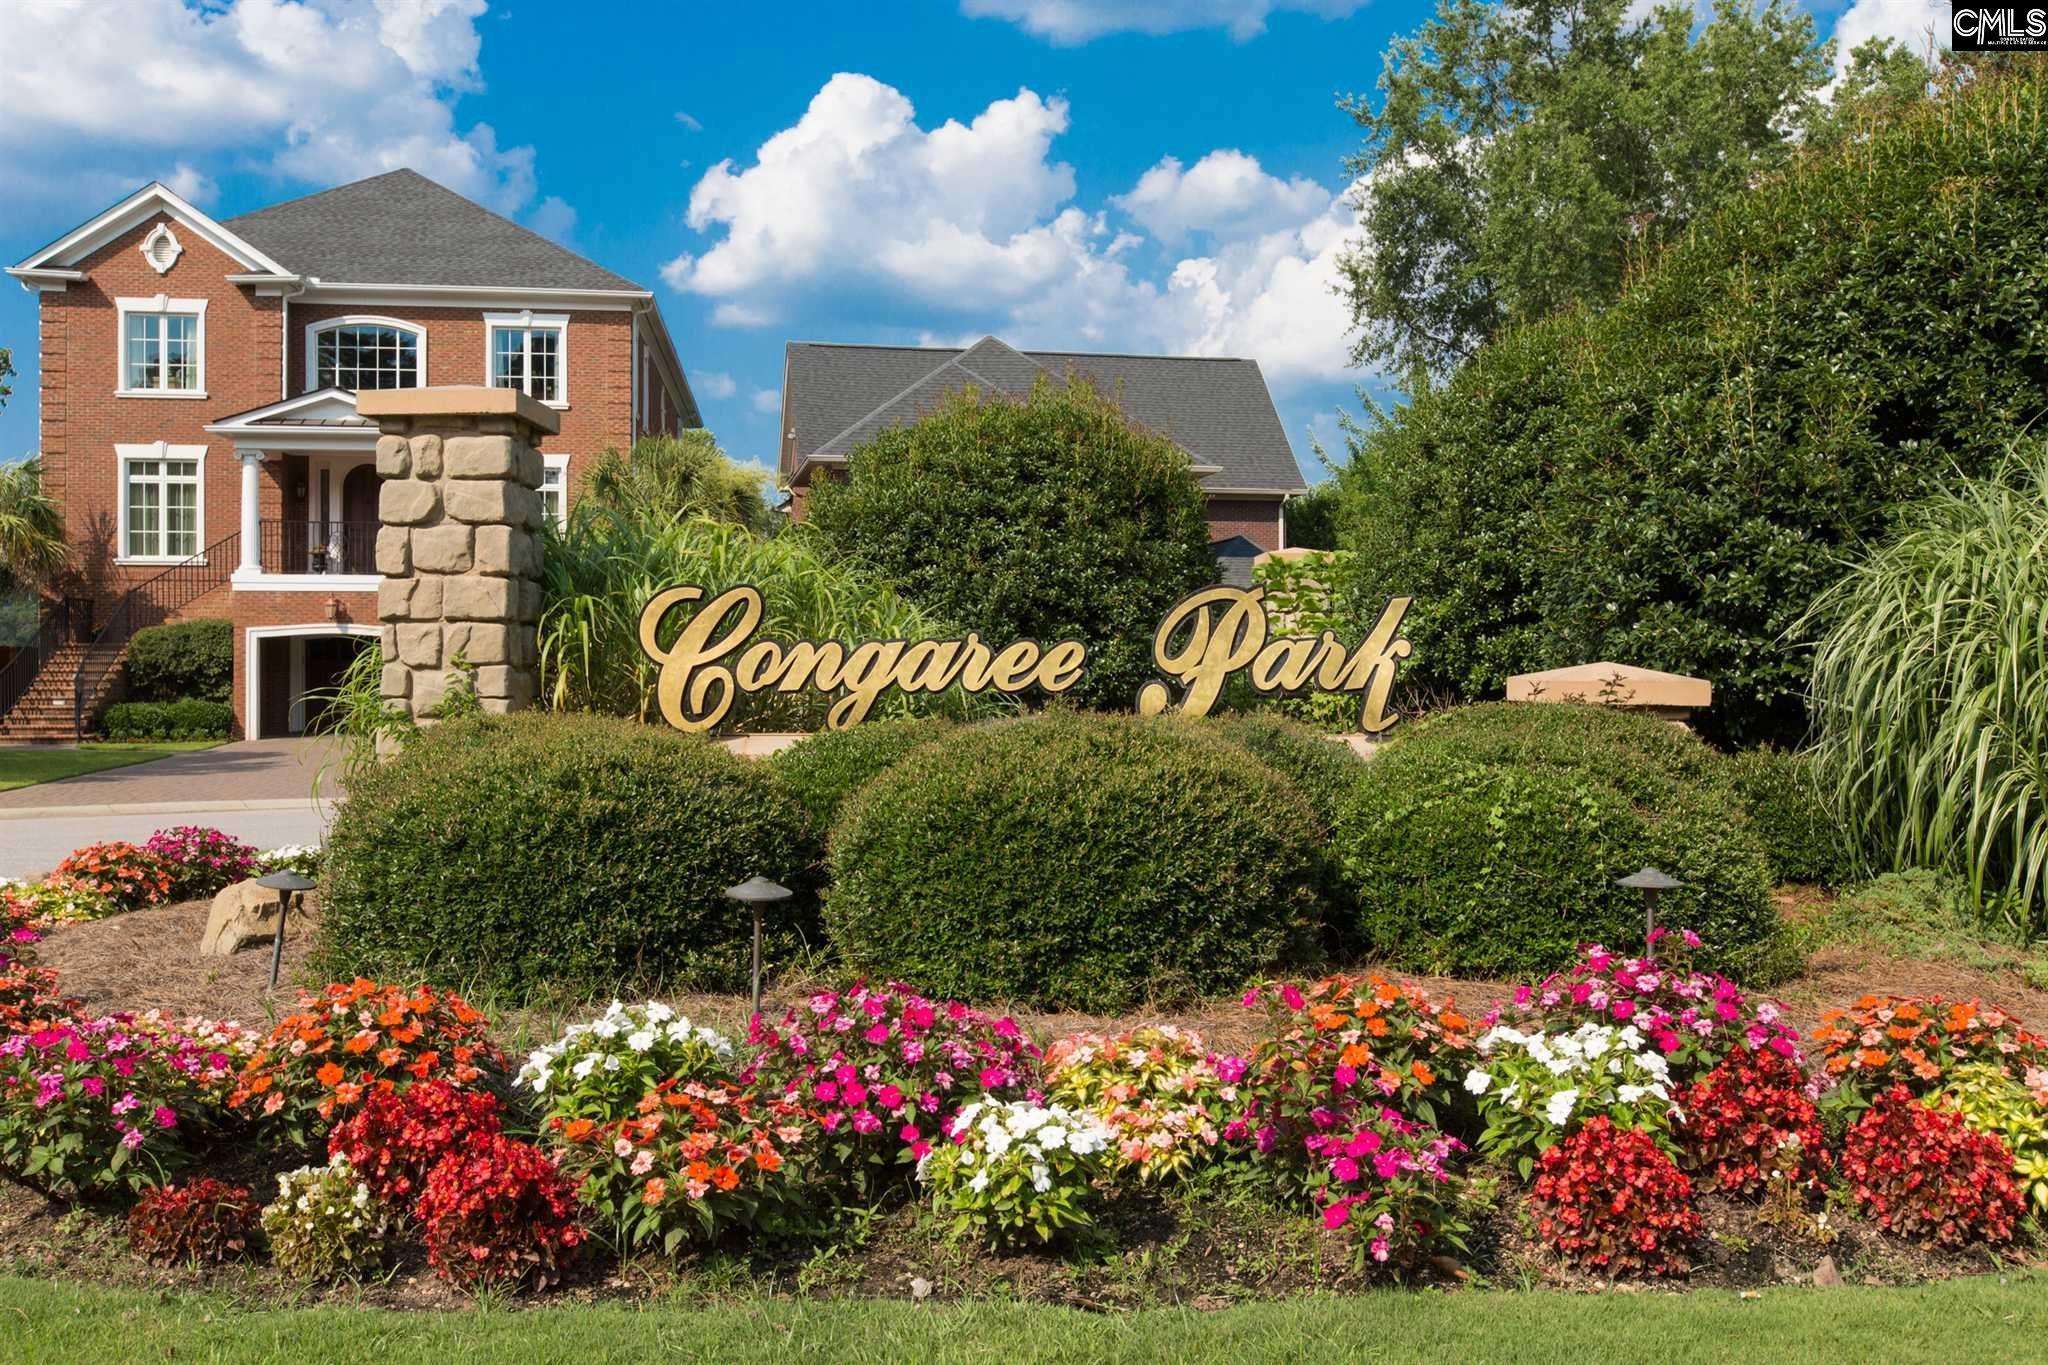 189 Congaree Park #Lot #2 West Columbia, SC 29169